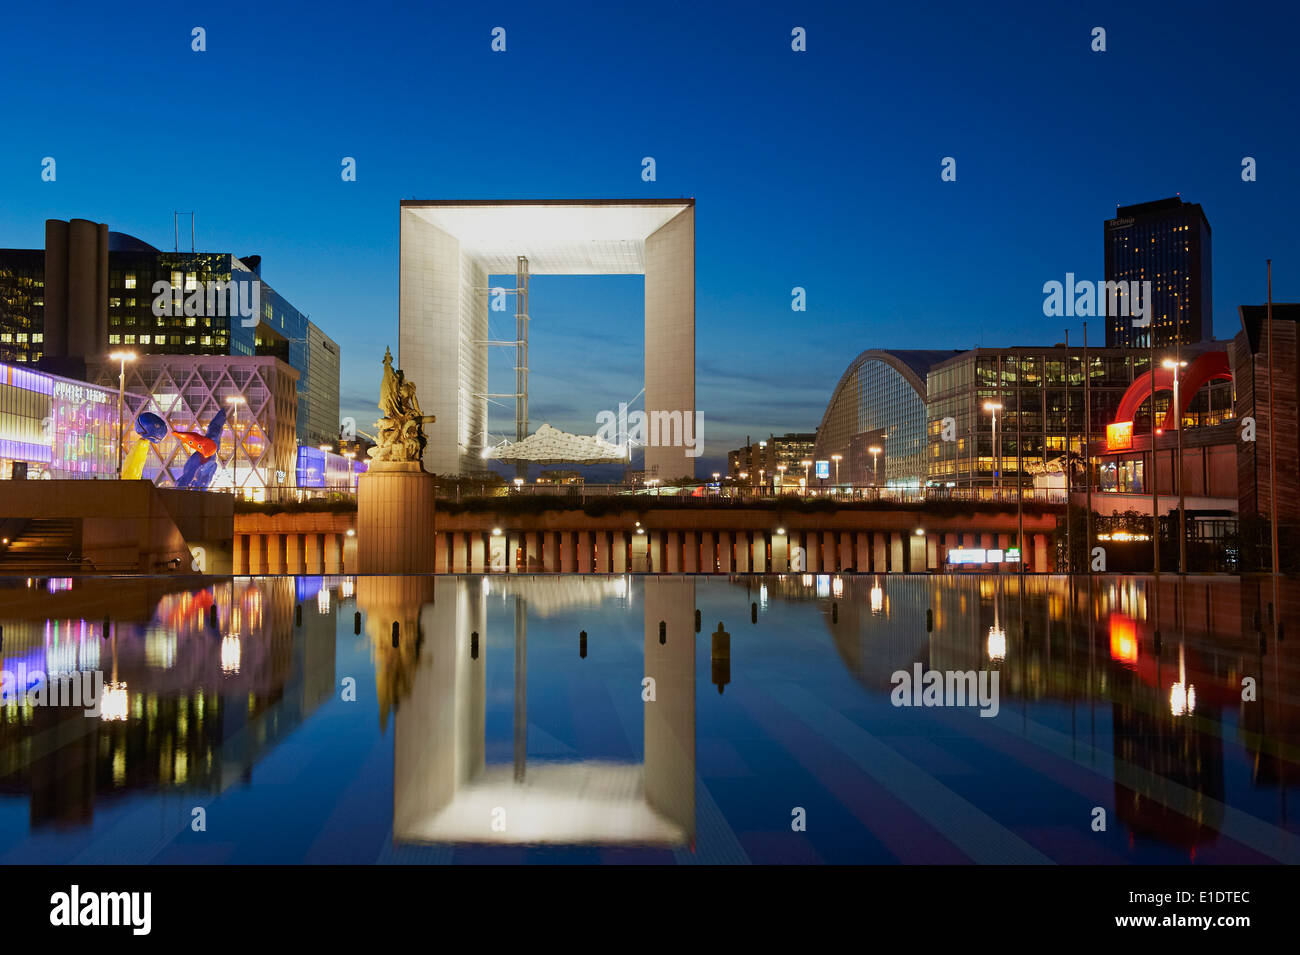 France, Paris, La Grande Arche de la Defense by architect Otto Von Spreckelsen at night - Stock Image